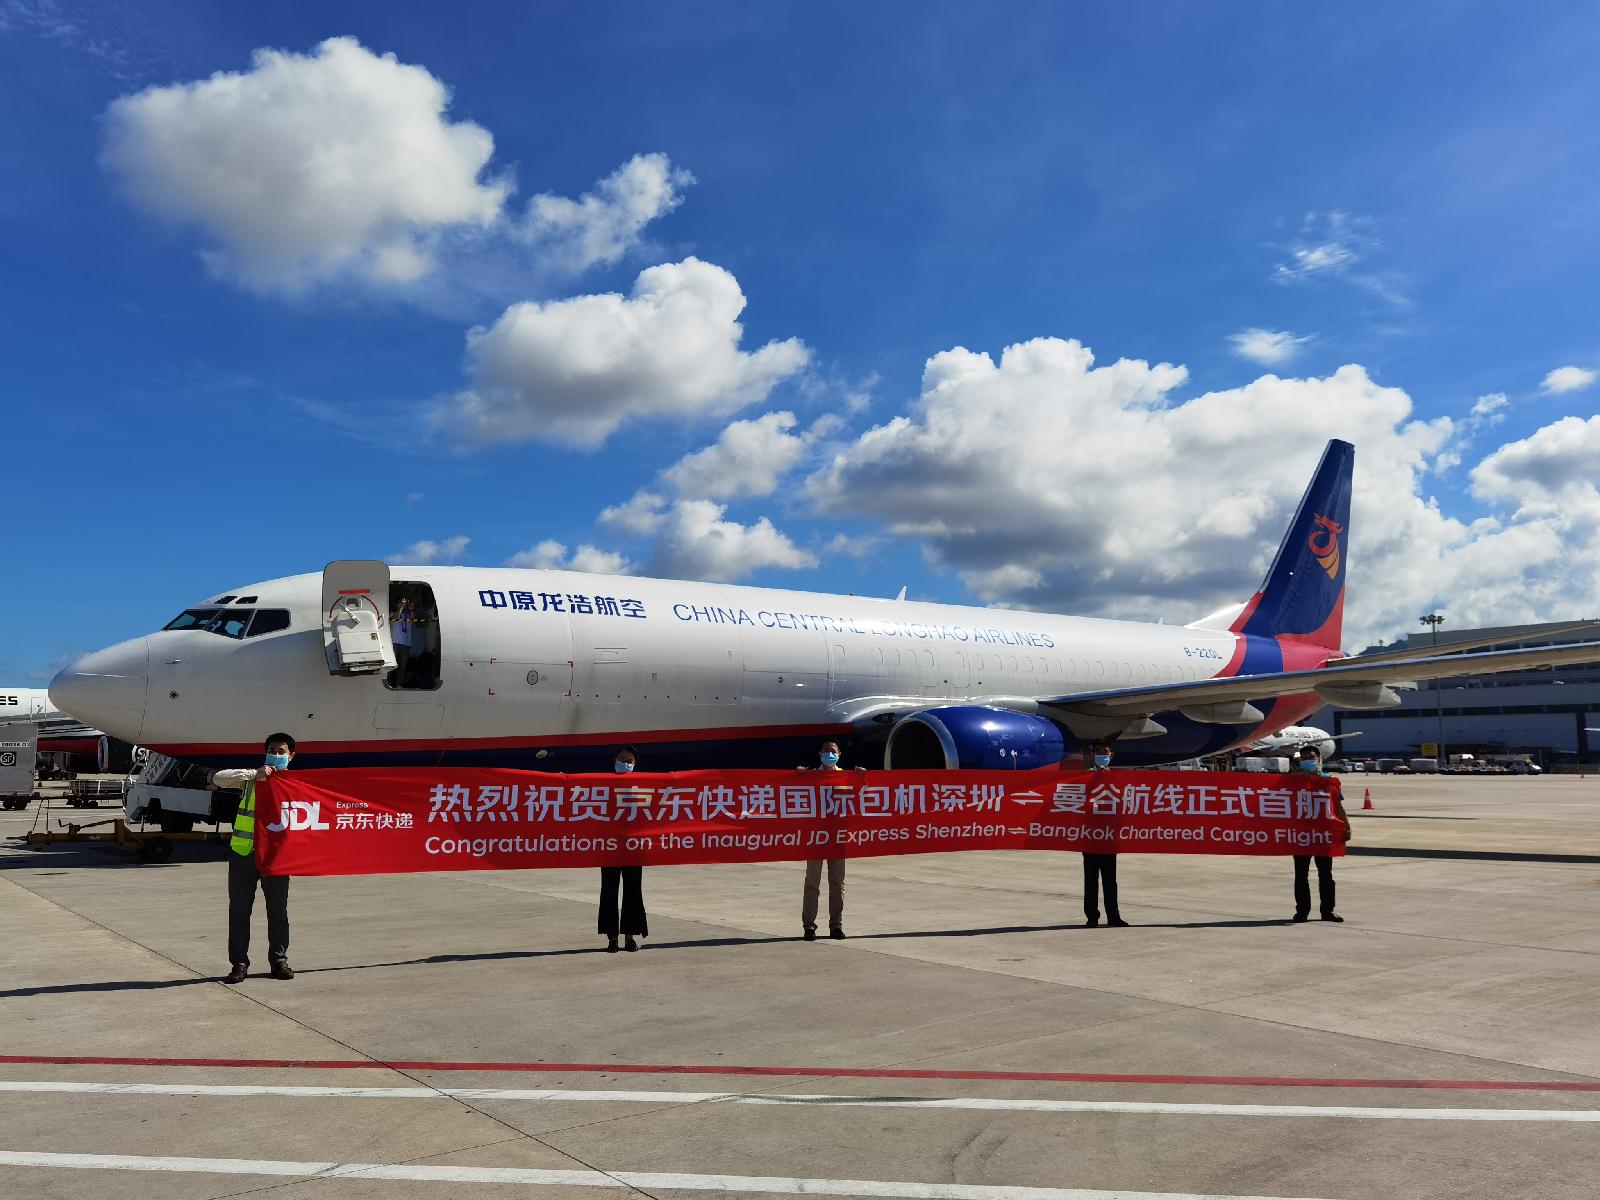 JD เปิดบริการเที่ยวบินเช่าเหมาลำจัดส่งสินค้าทางอากาศ จากเซินเจิ้น – กรุงเทพฯปักธงสนันสนุนเอสเอ็มอีไทย-จีนโตข้ามพรมแดน